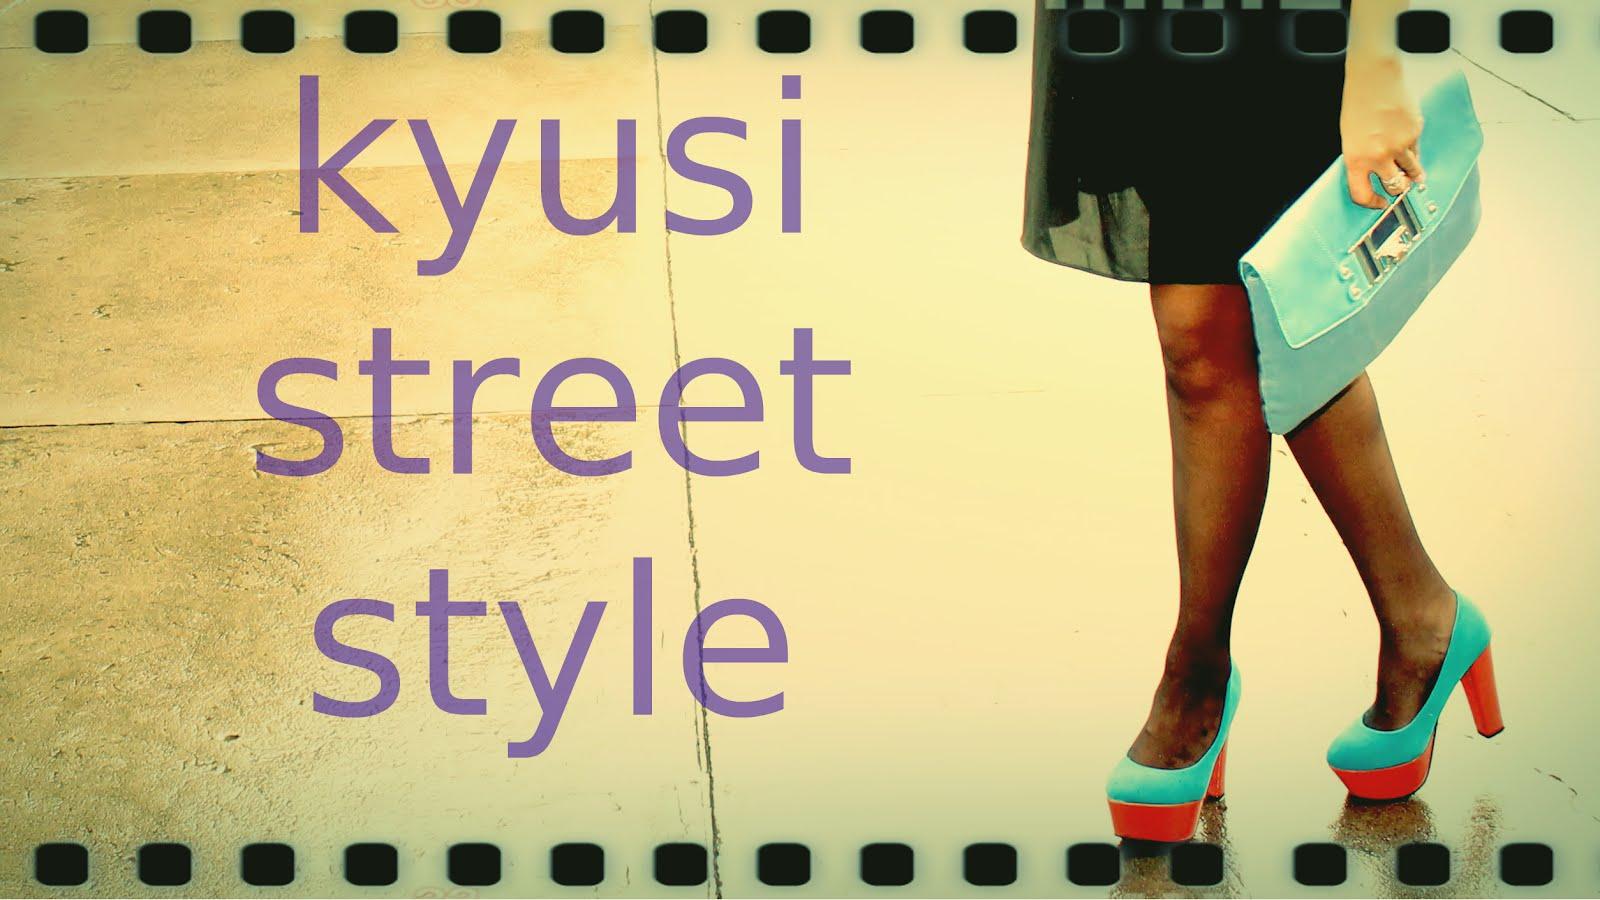 kyusi street style